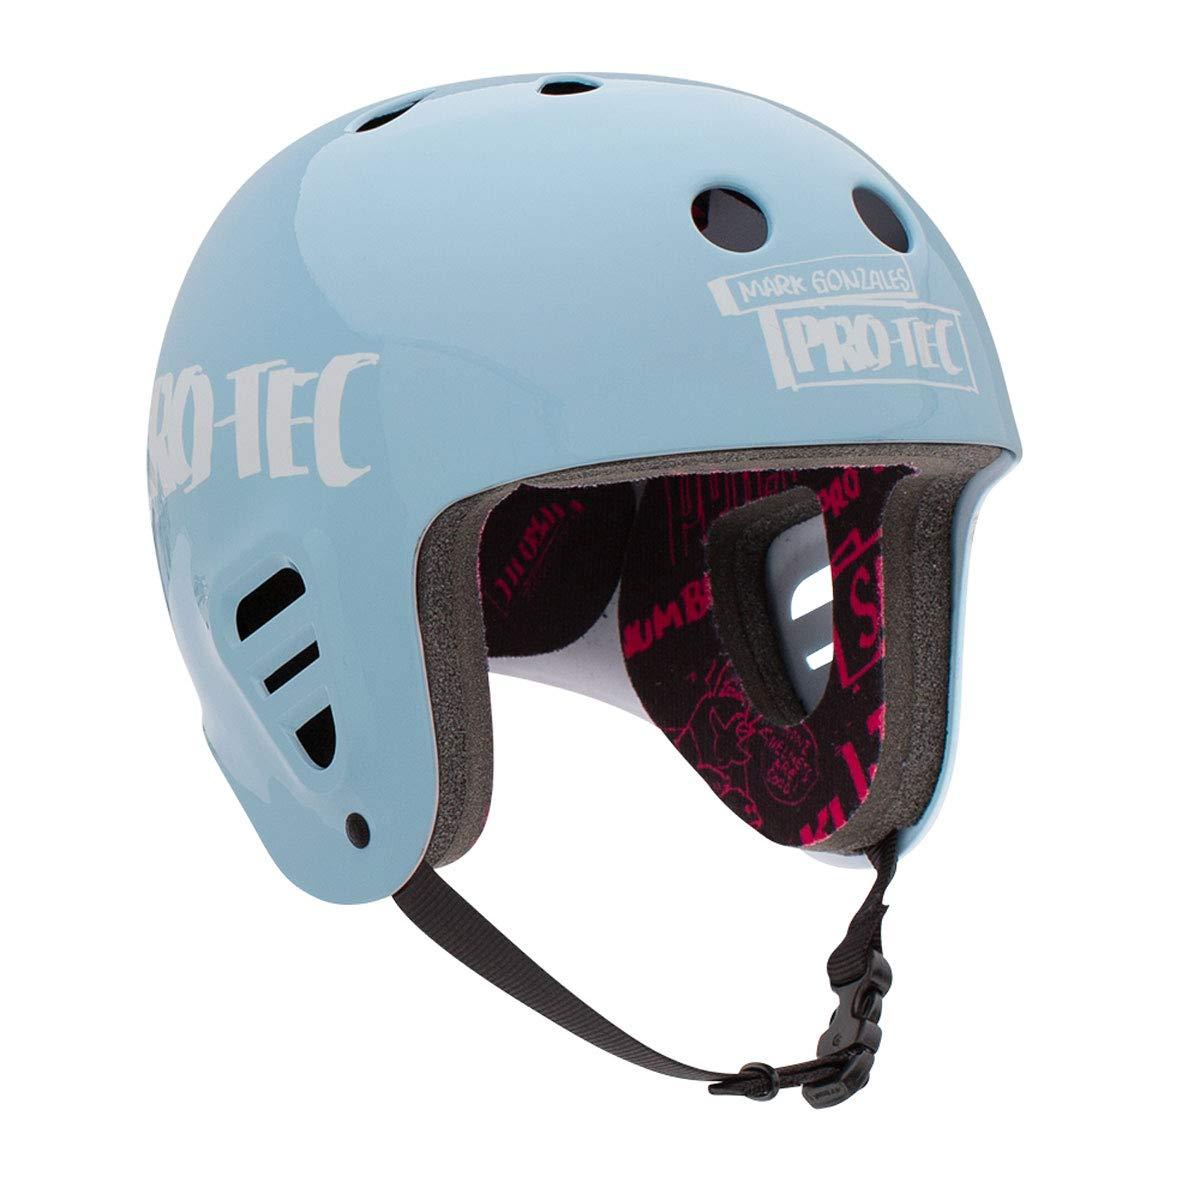 Pro Tec Full Cut Gonz 2 Helmet - Light Blue - XL